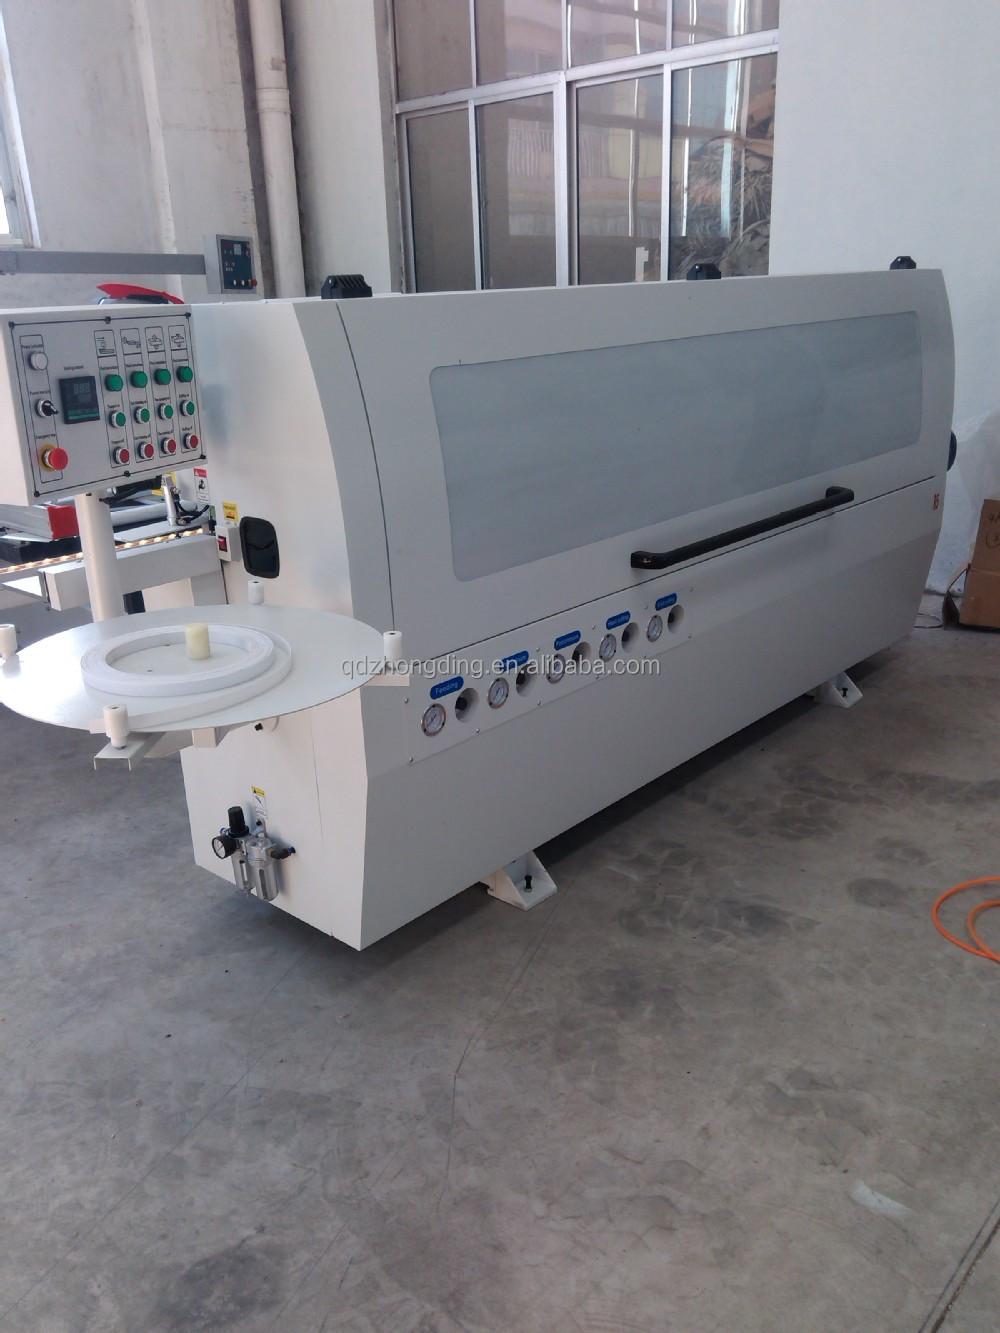 hinge boring machine for sale